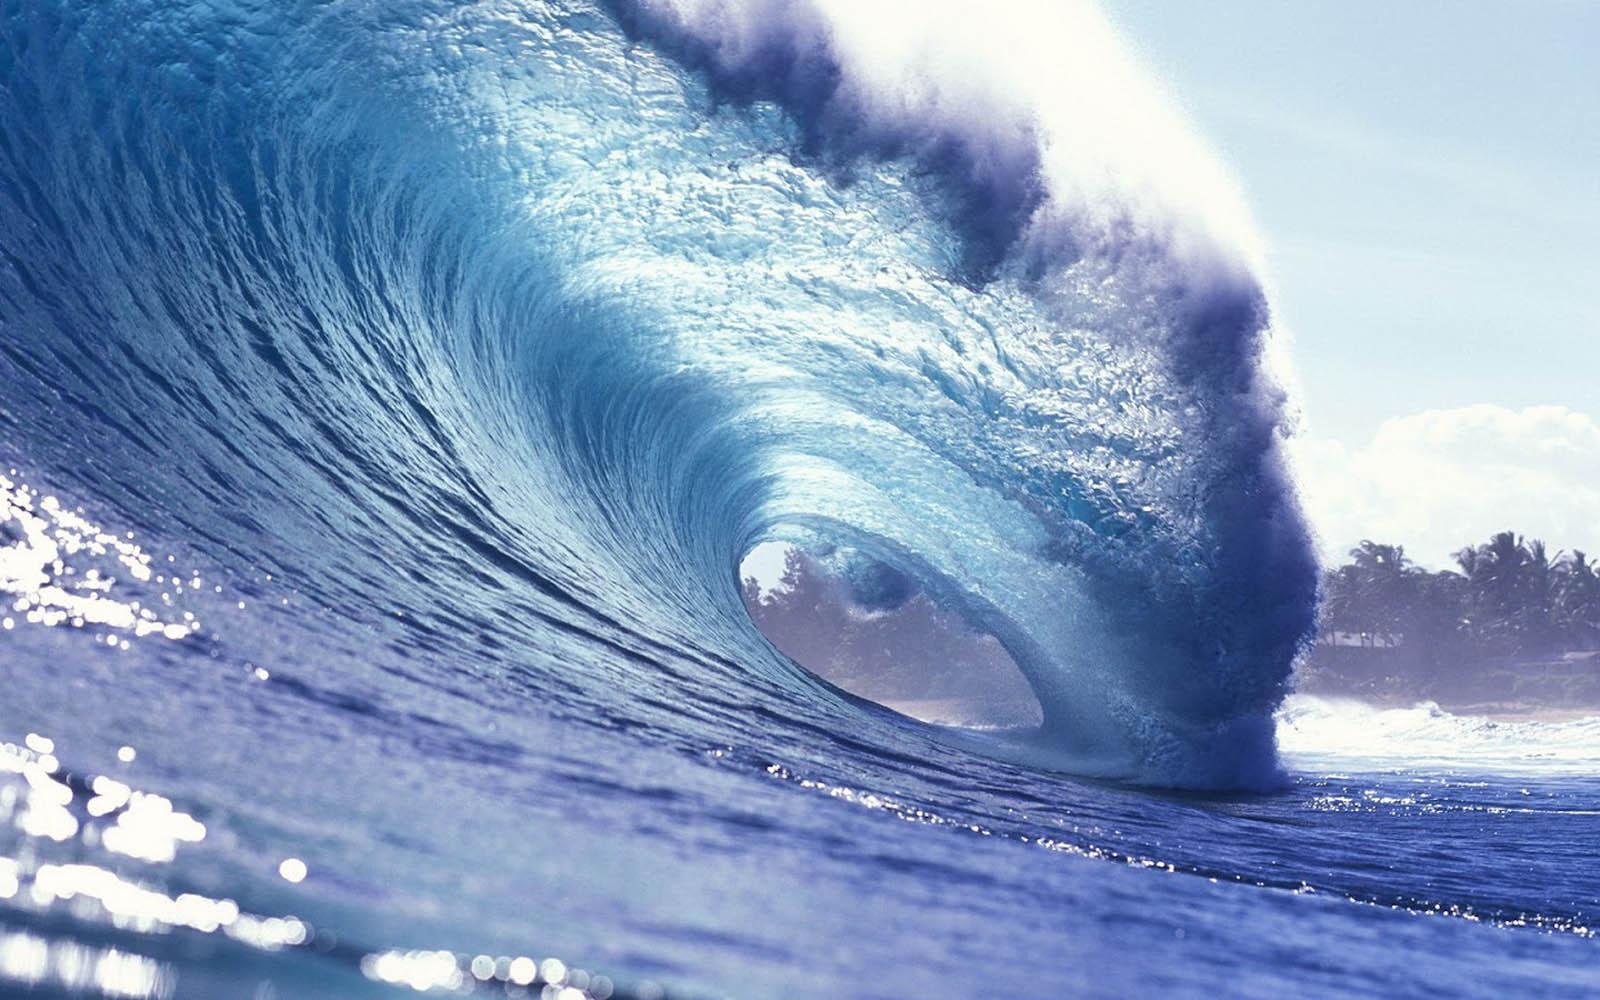 Circle Of Ocean Waves Wallpaper HD 10456 Wallpaper High Resolution 1600x1000